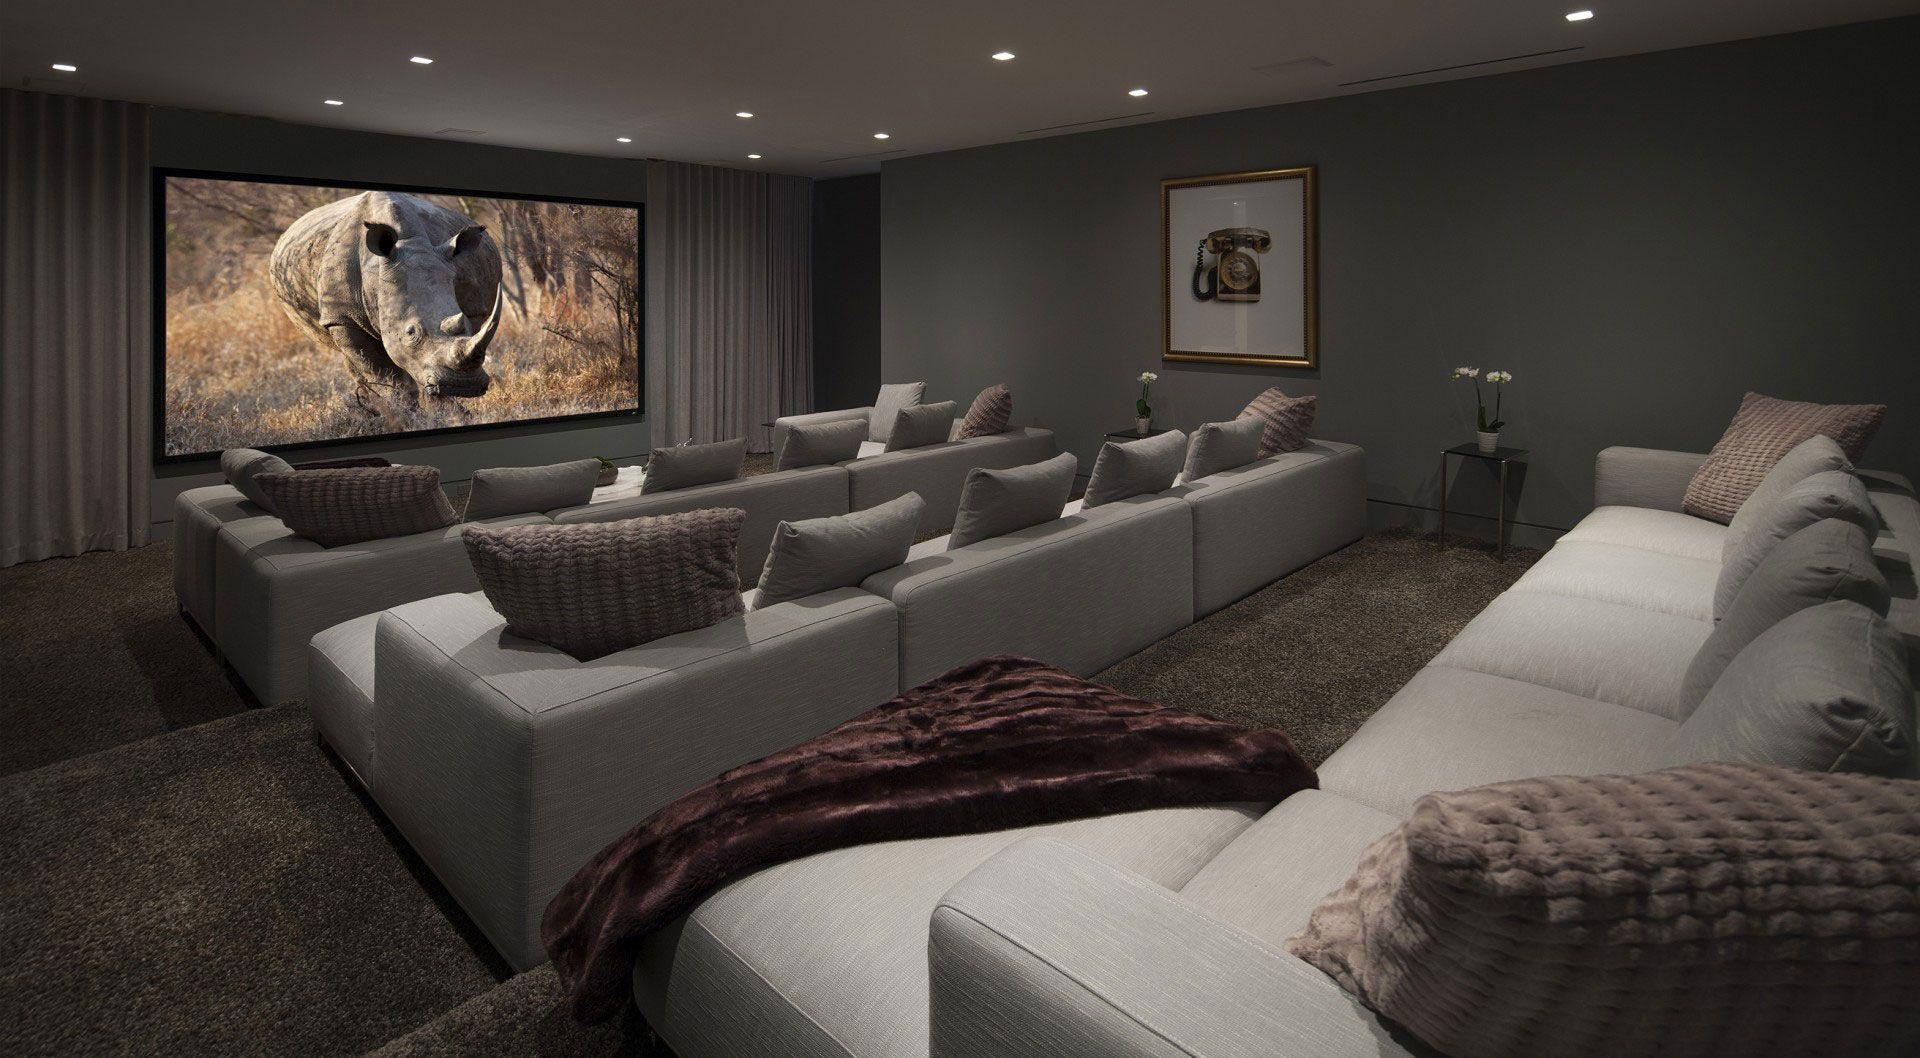 Simple Home And Apartment Interior Design Home Cinema Room Home